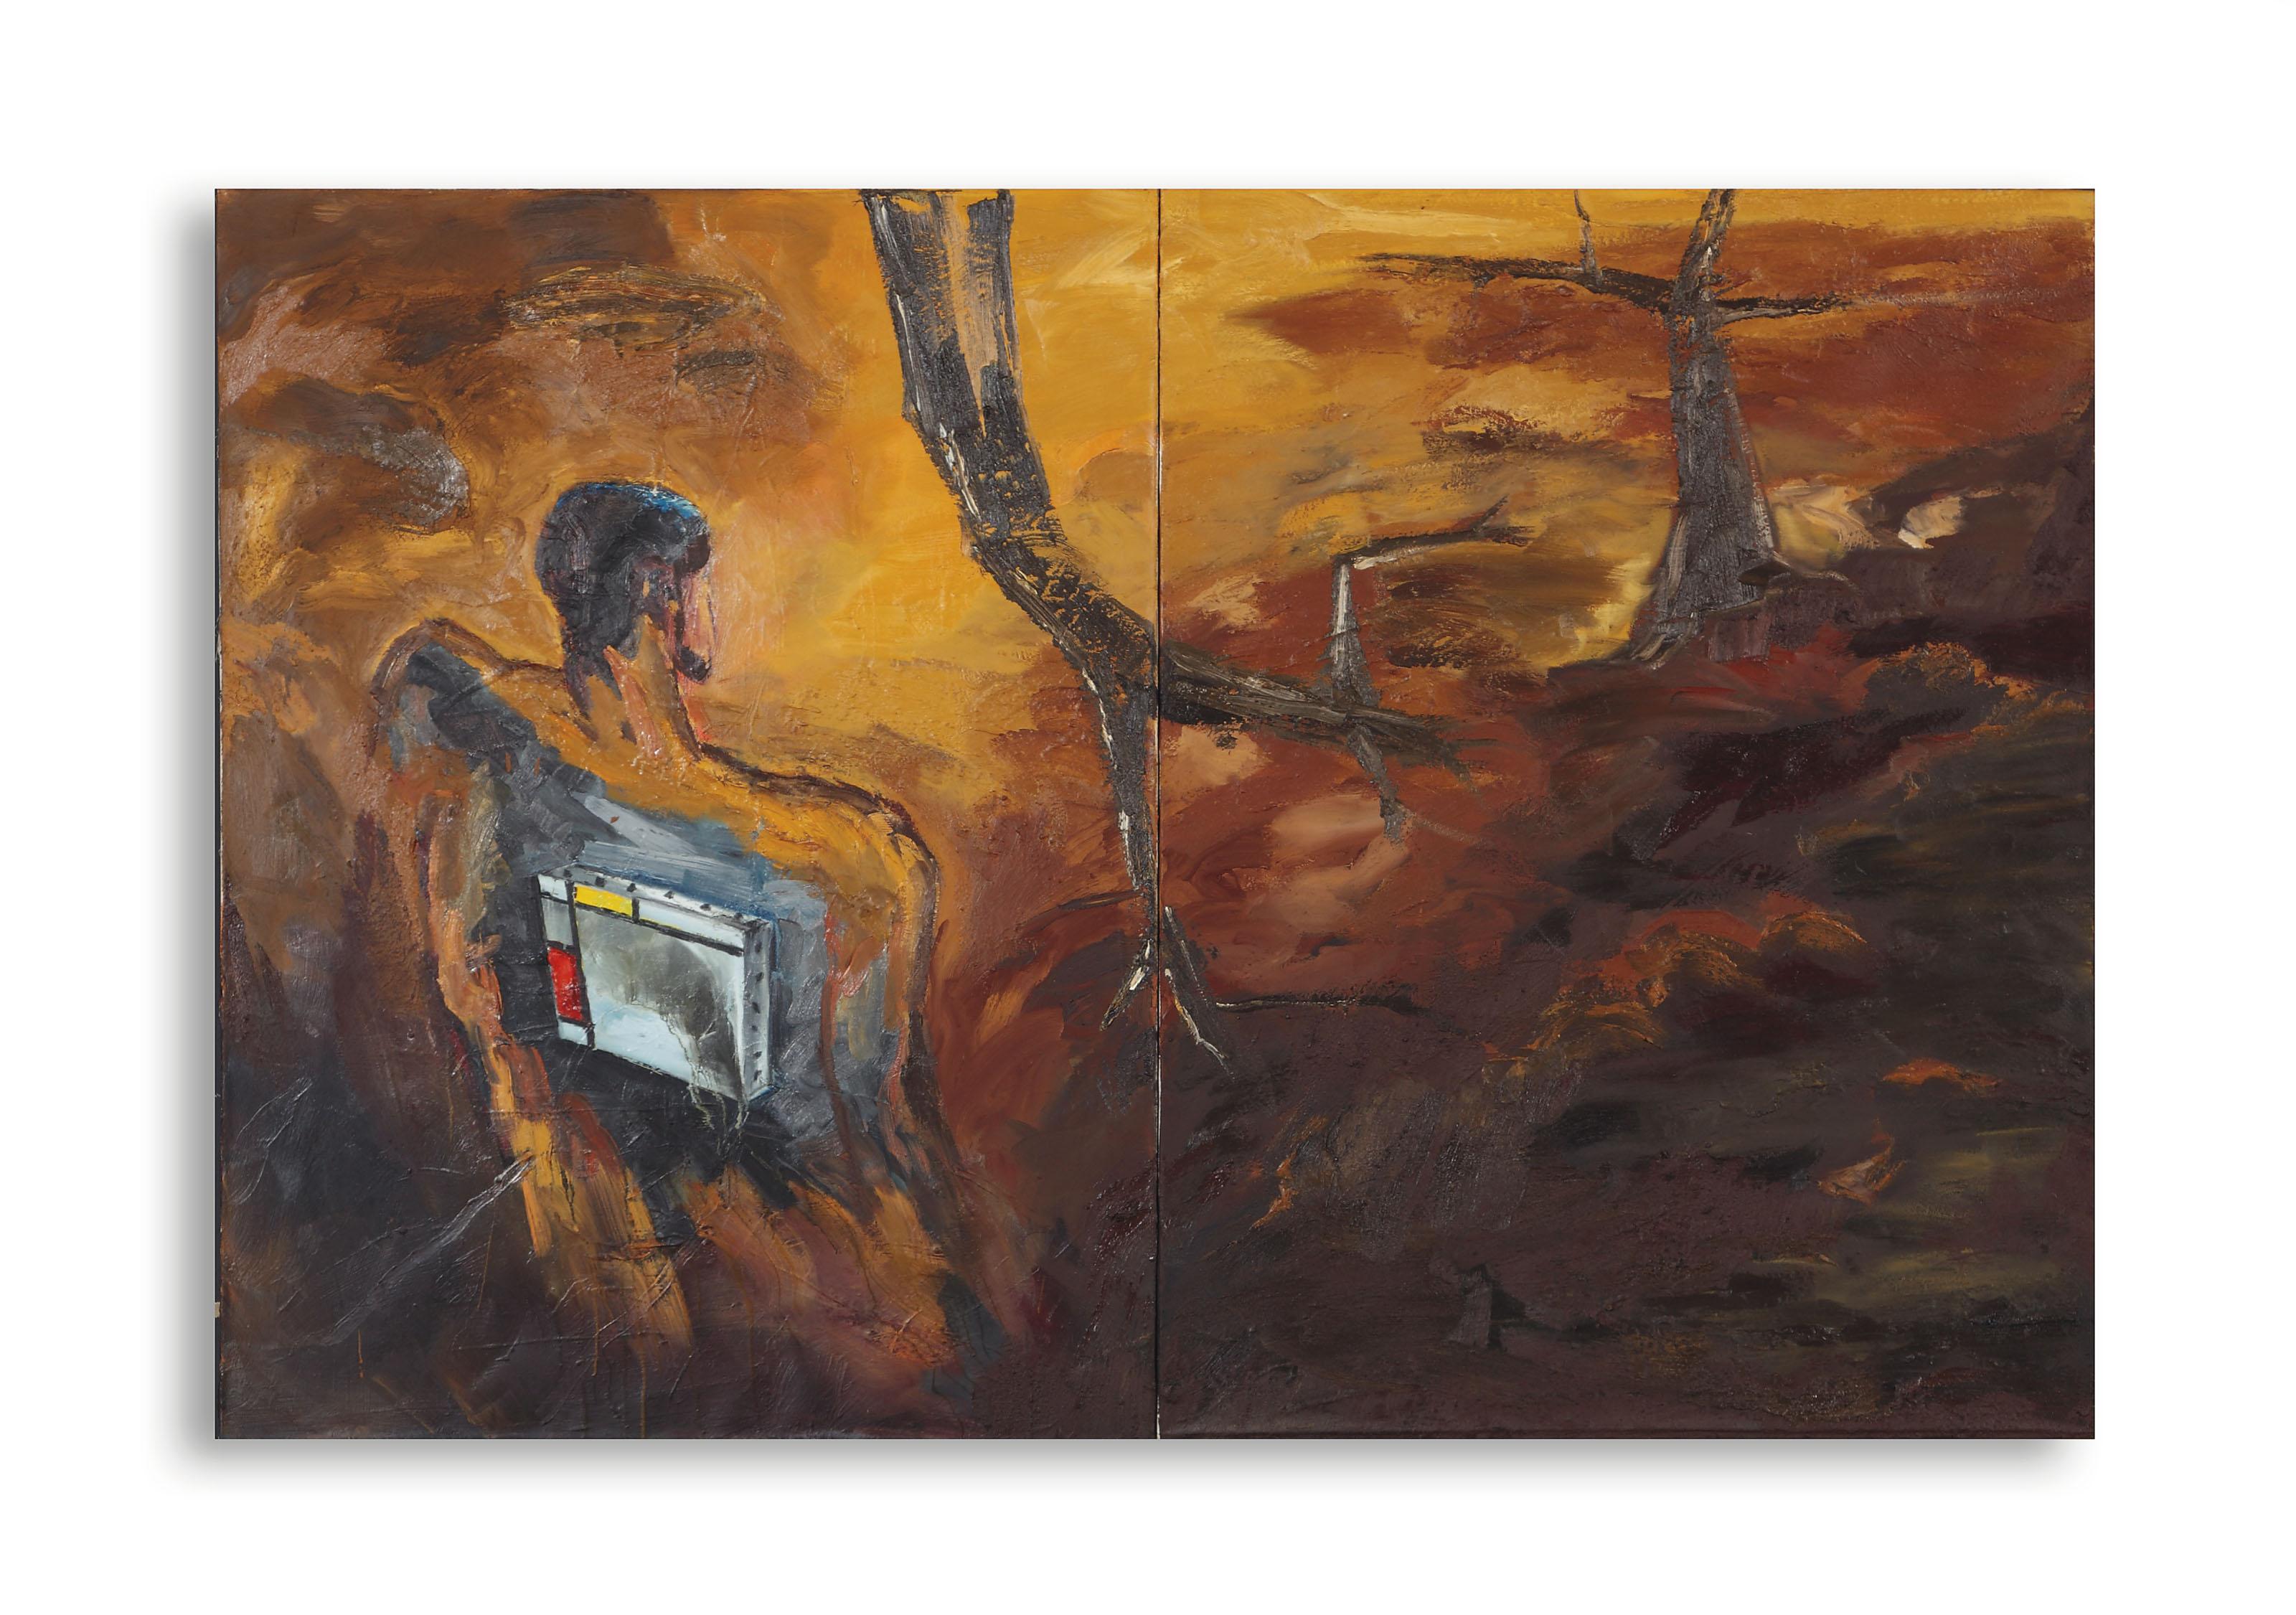 Untitled (Figur mit Mondrian-Bild) (Figure with Mondrian Painting)